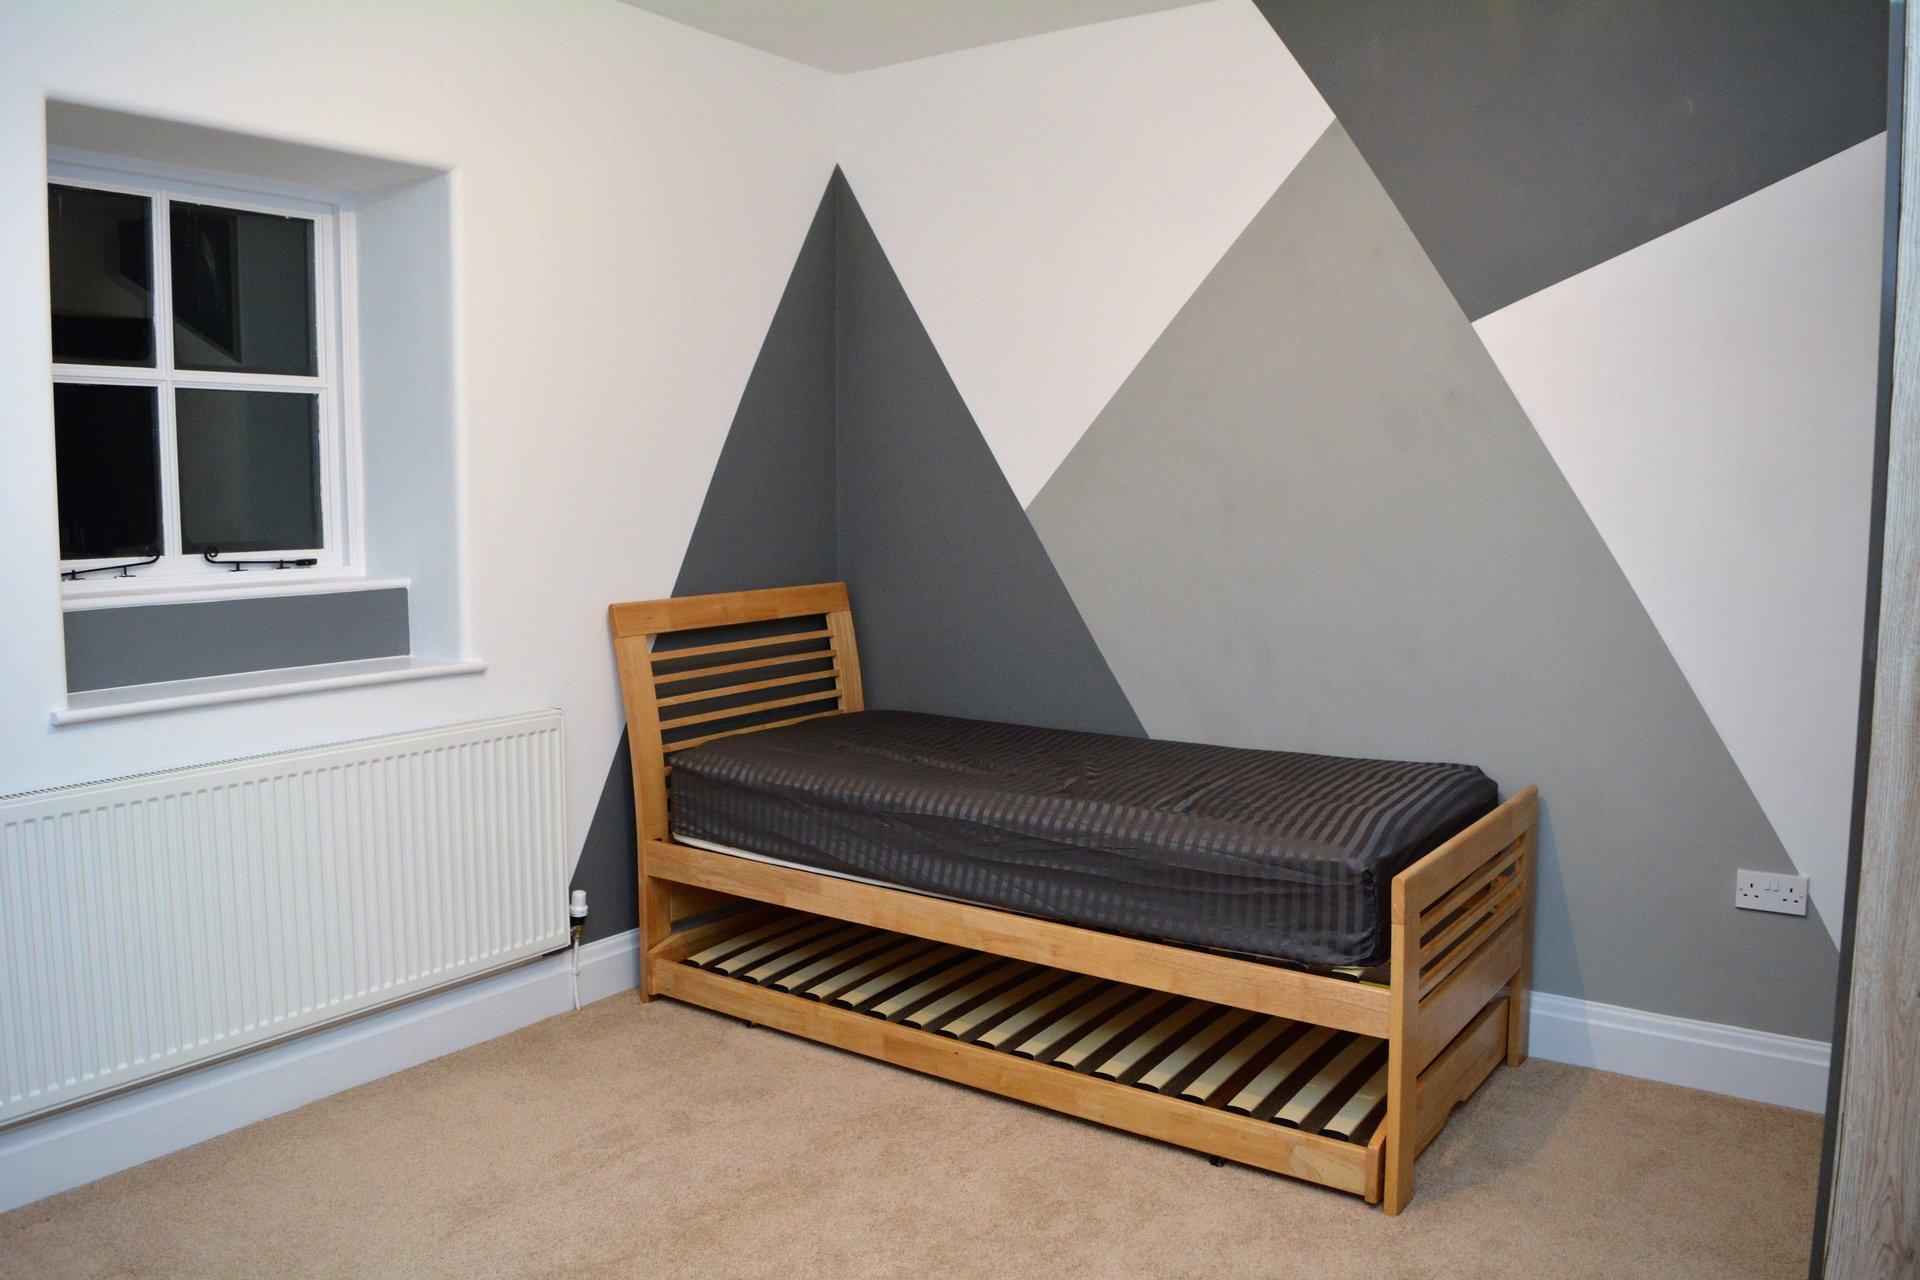 Shared Boys Geometrical Bedroom: Geometric Hand Painted Boys Room Makeover